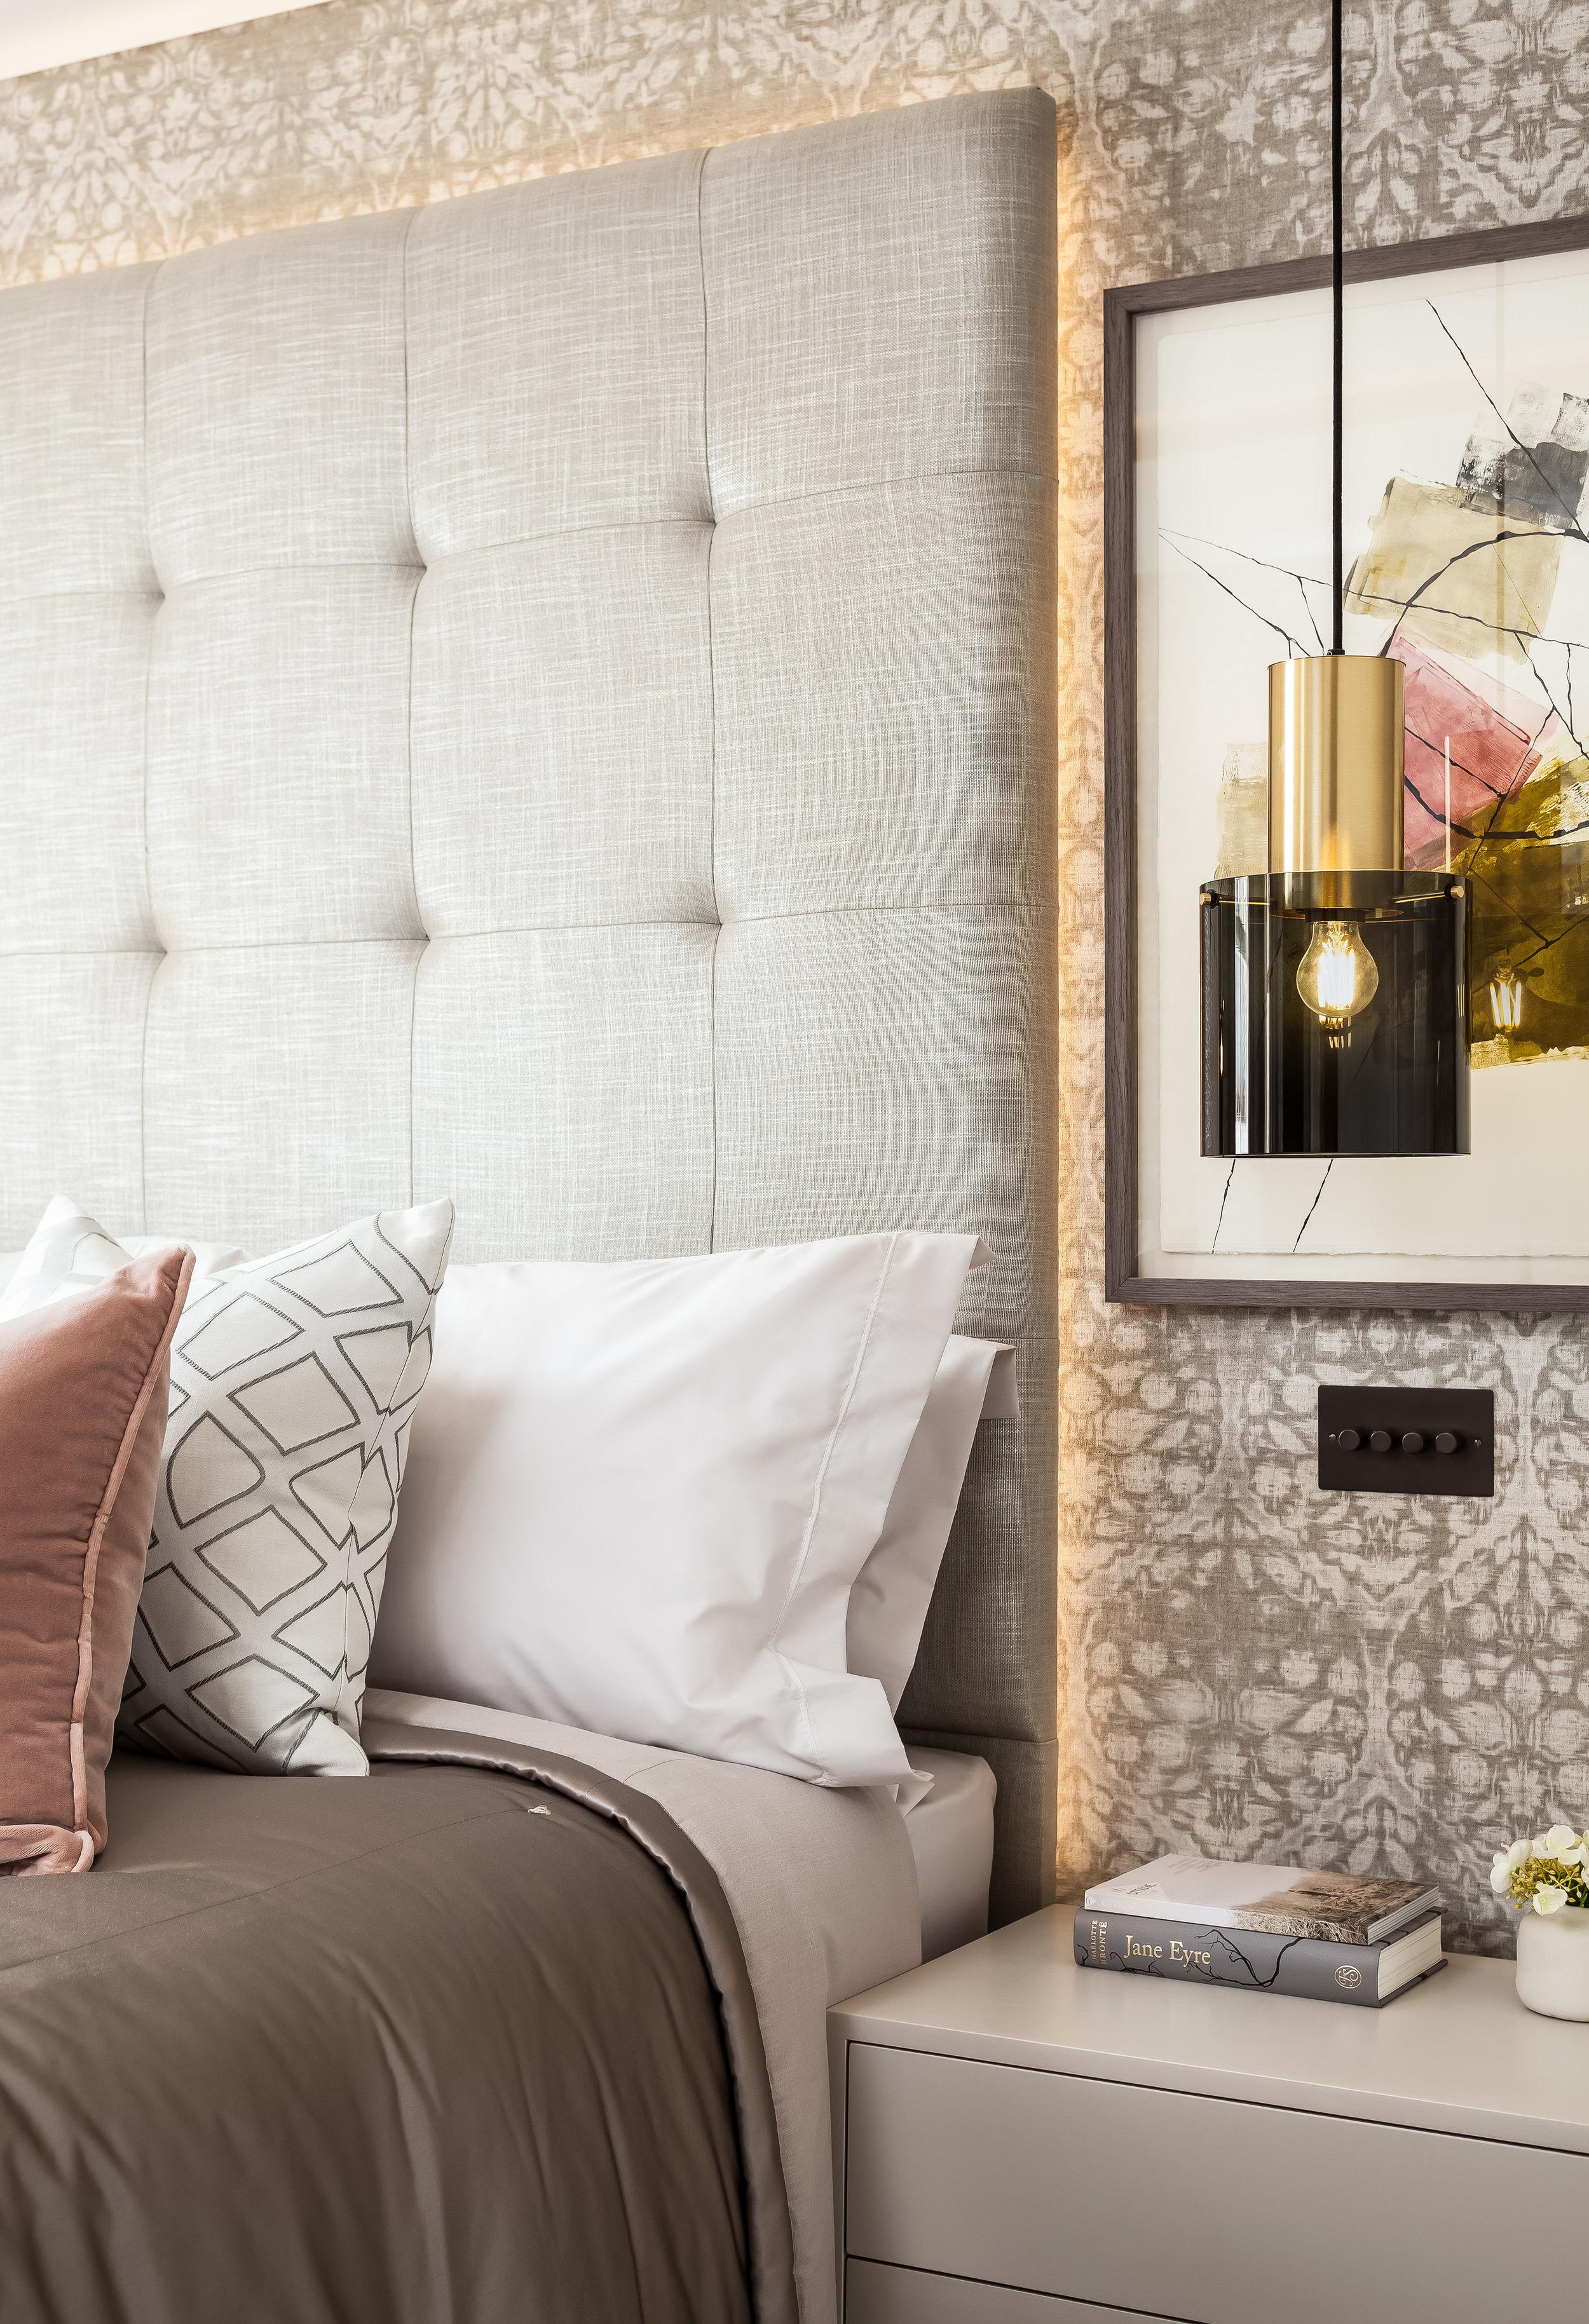 Jo Hamilton Interiors - Kensington bedroom bedside